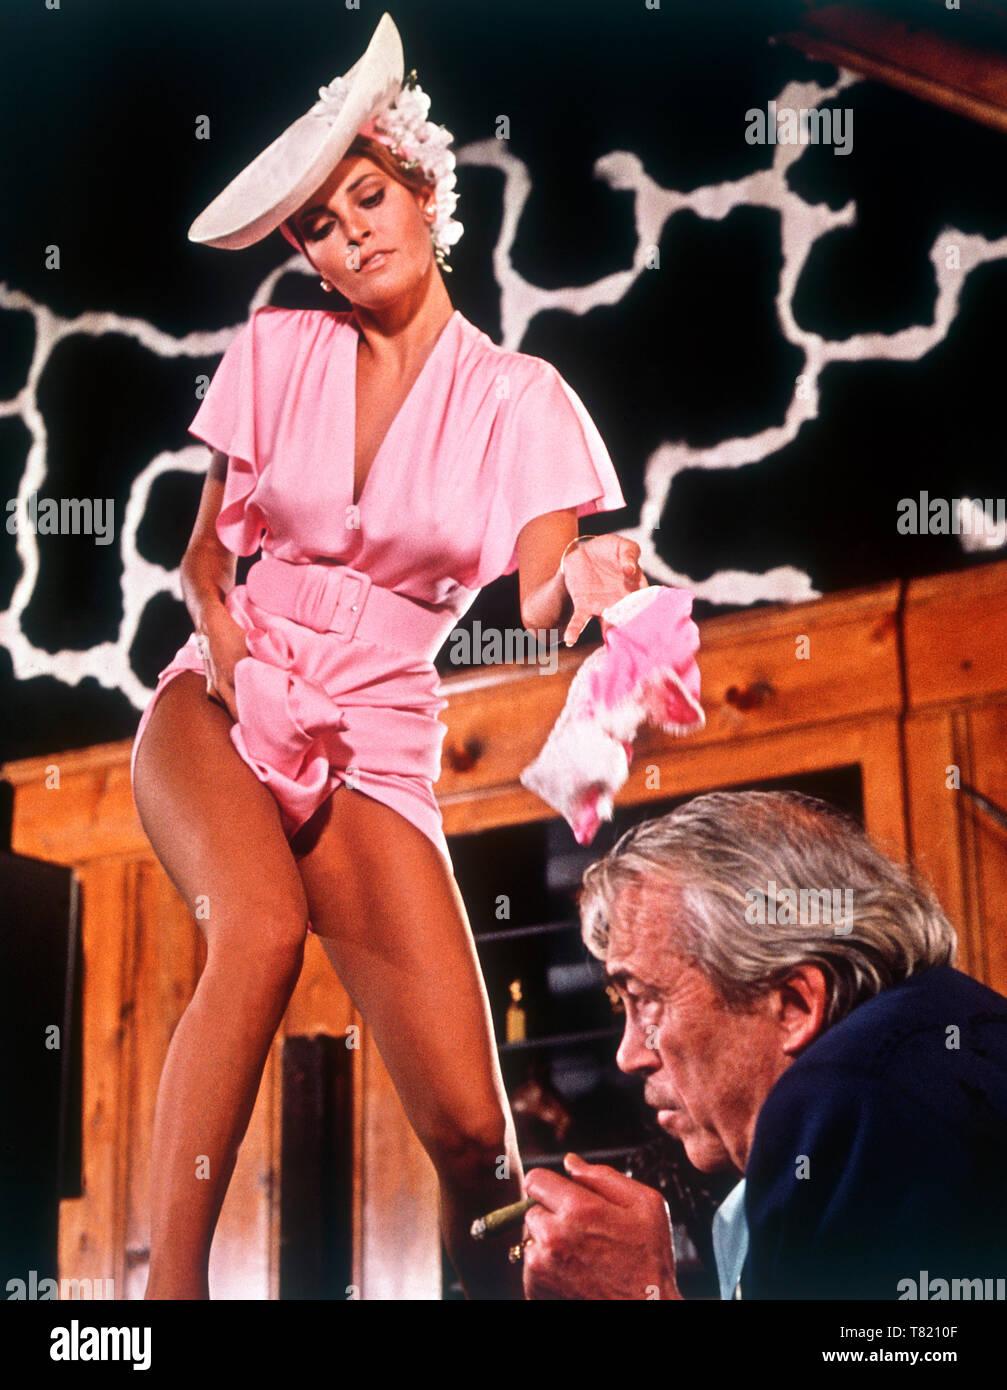 raquel welch and john huston, 1970 - Stock Image